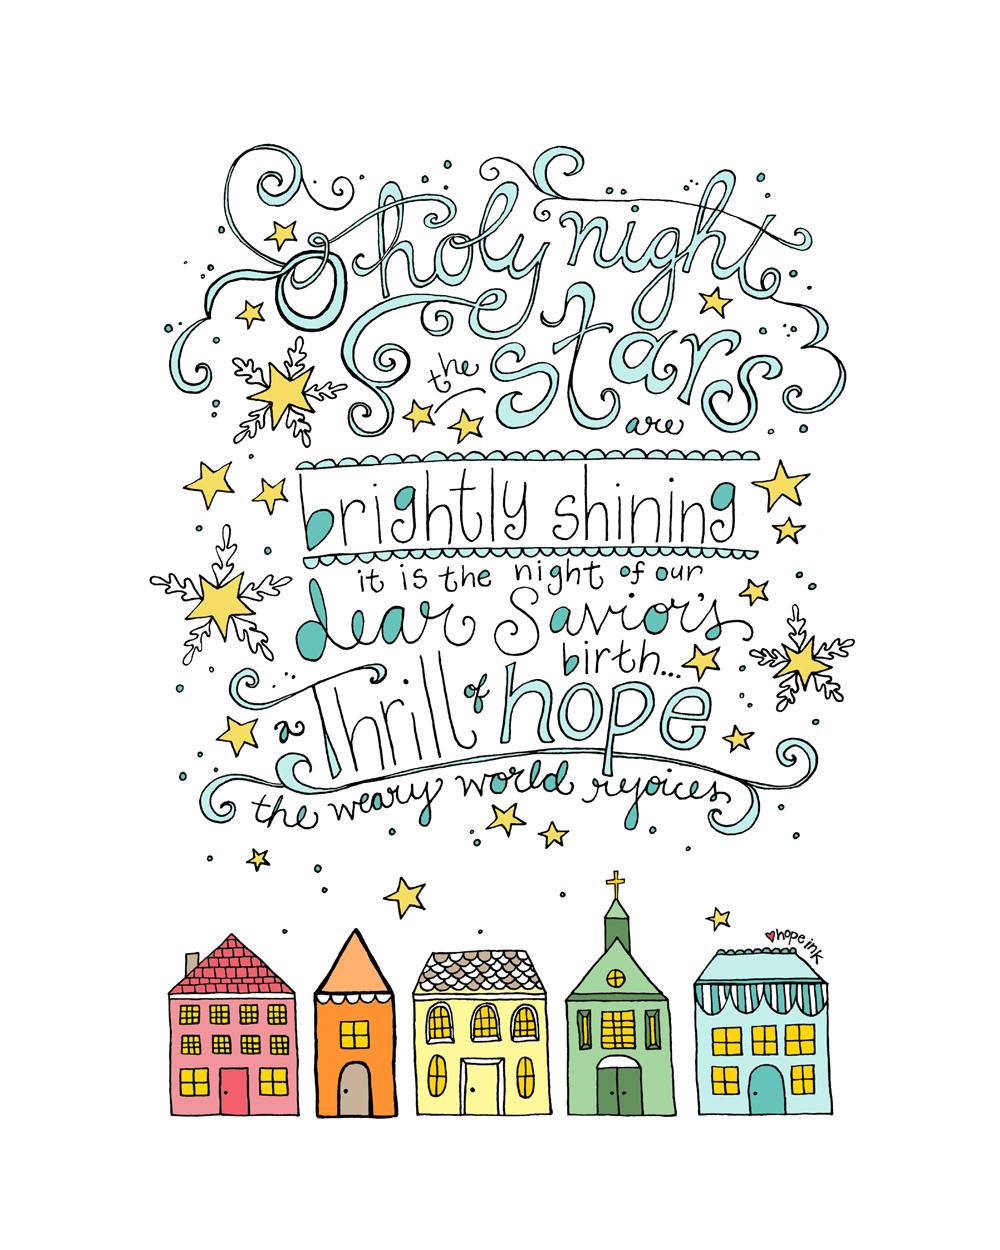 O Holy Night Rainbow Row Houses Hand Lettered Christmas Art Hope Ink.jpg